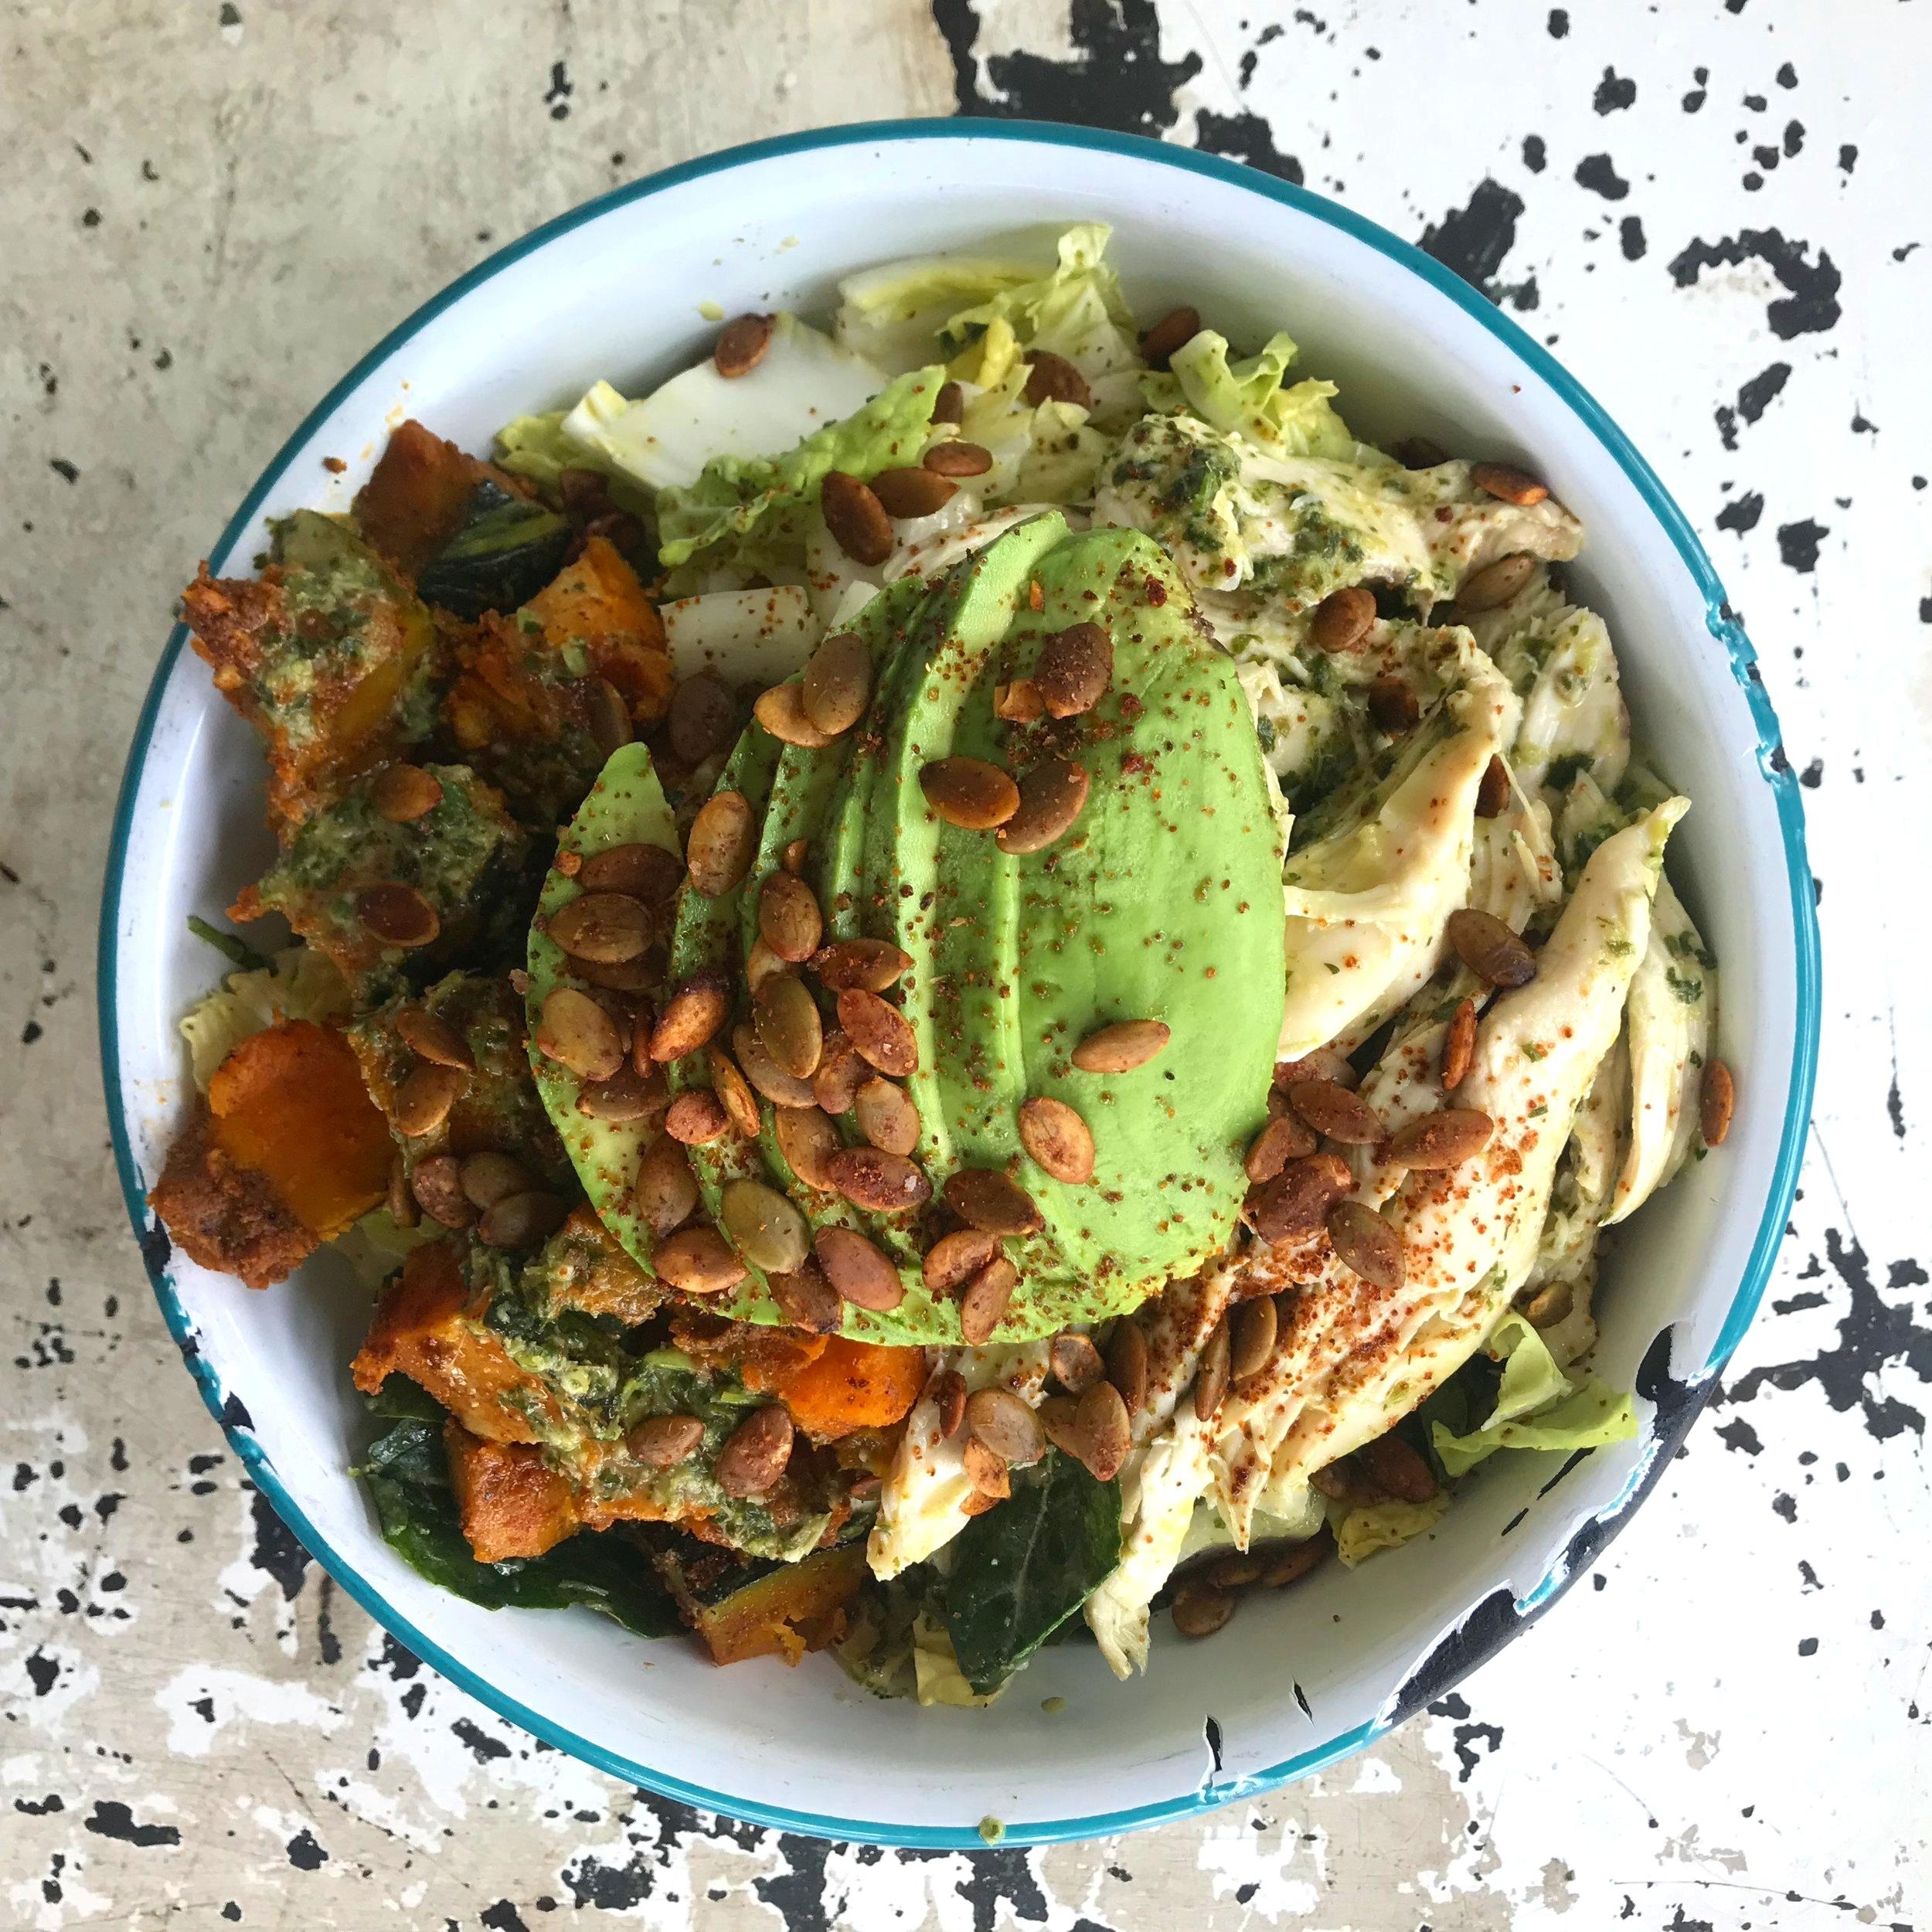 misfit+wellness+lunch+ideas